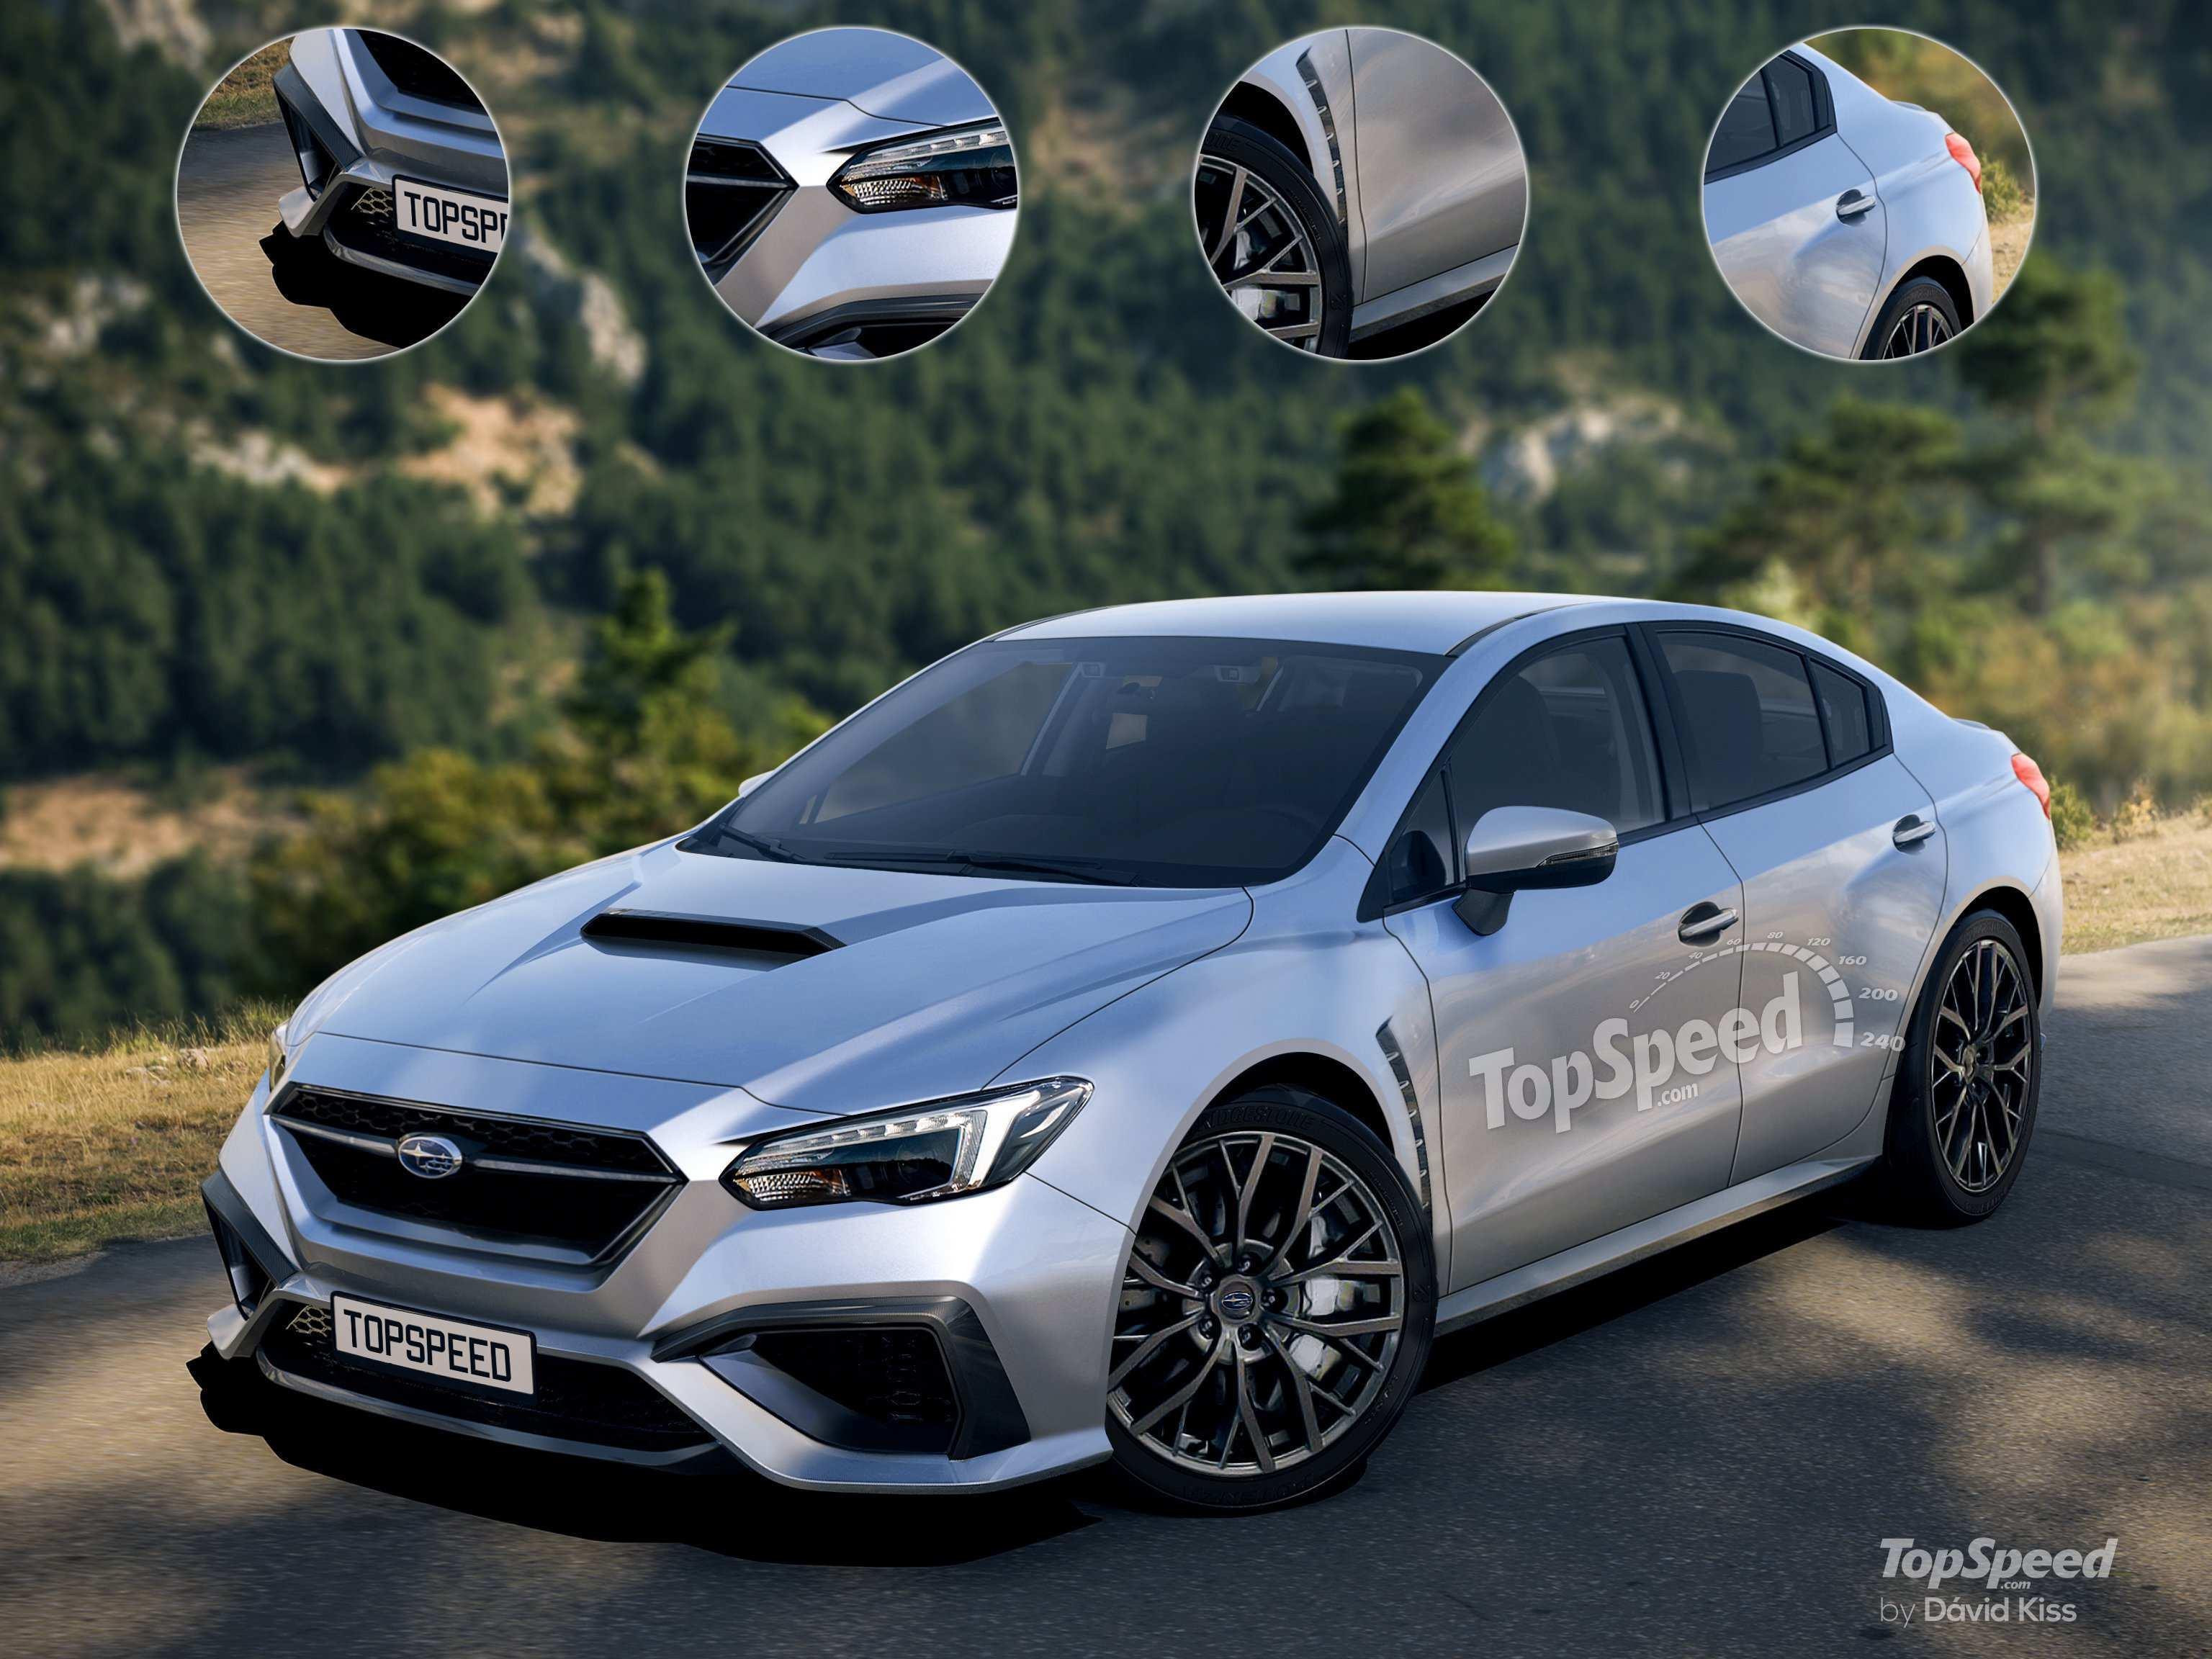 78 Concept of 2020 Subaru Wrx New Review by 2020 Subaru Wrx